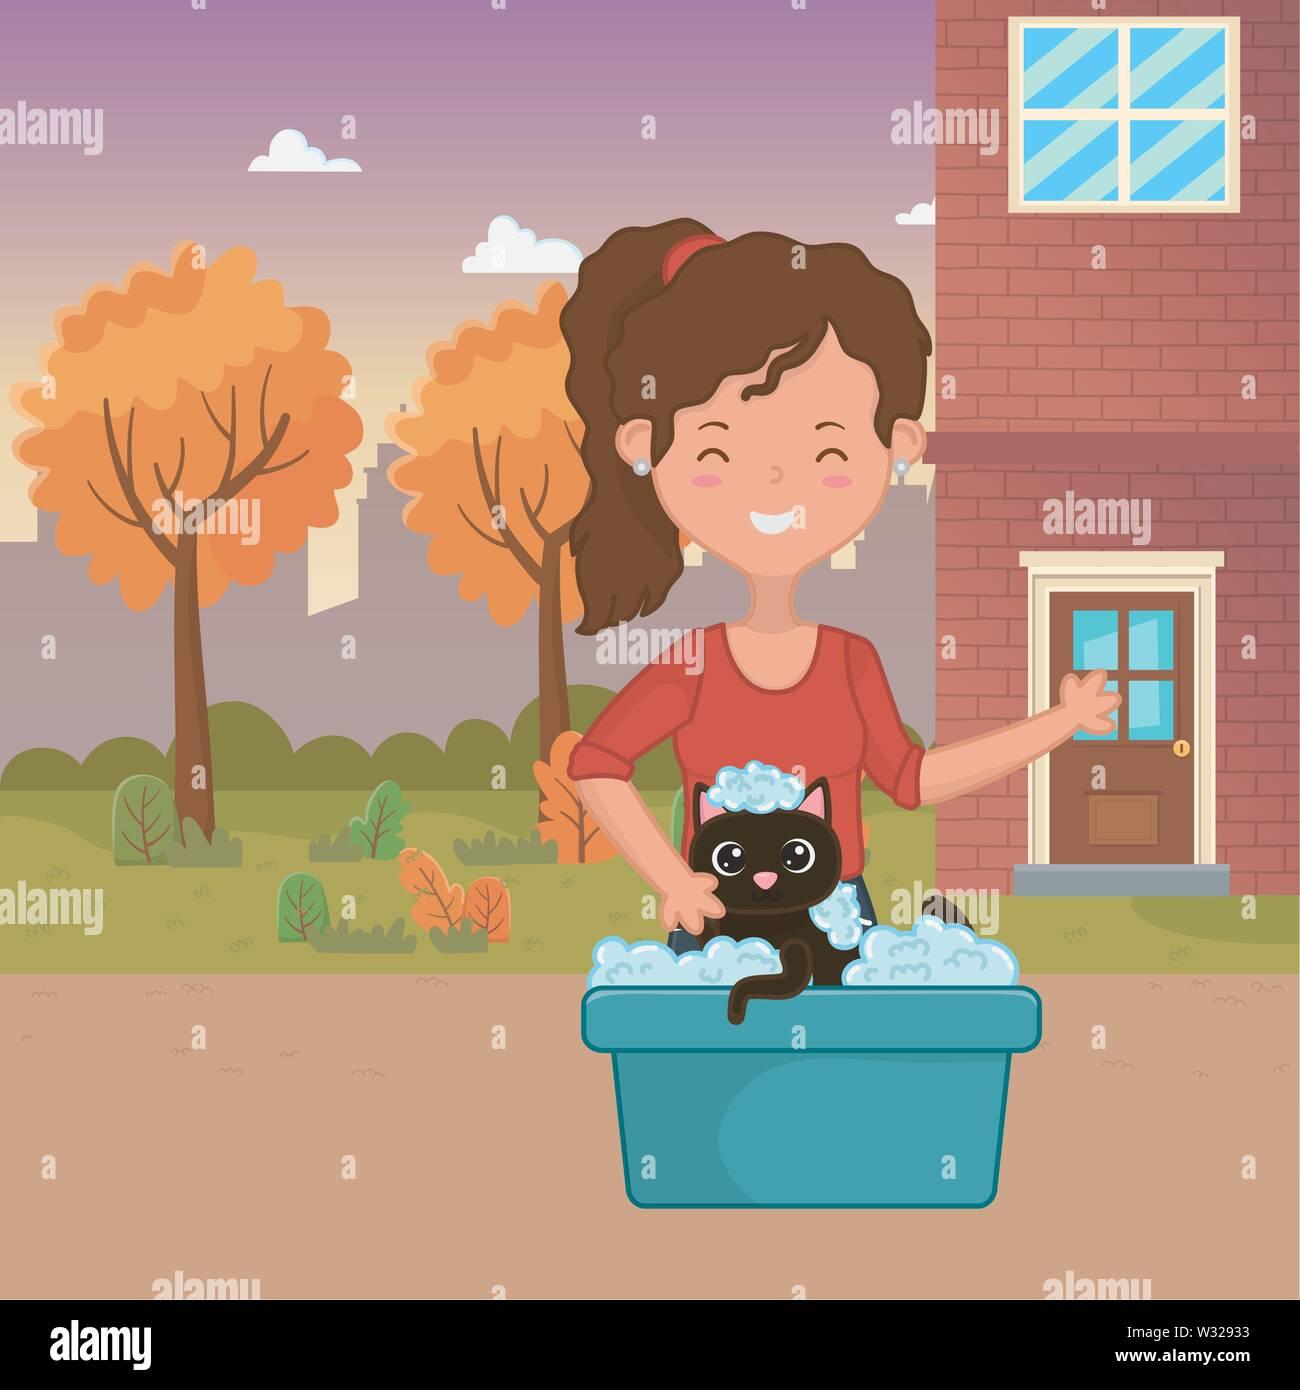 Girl with cat cartoon design, Mascot pet animal domestic cute life nature and fauna theme Vector illustration - Stock Image